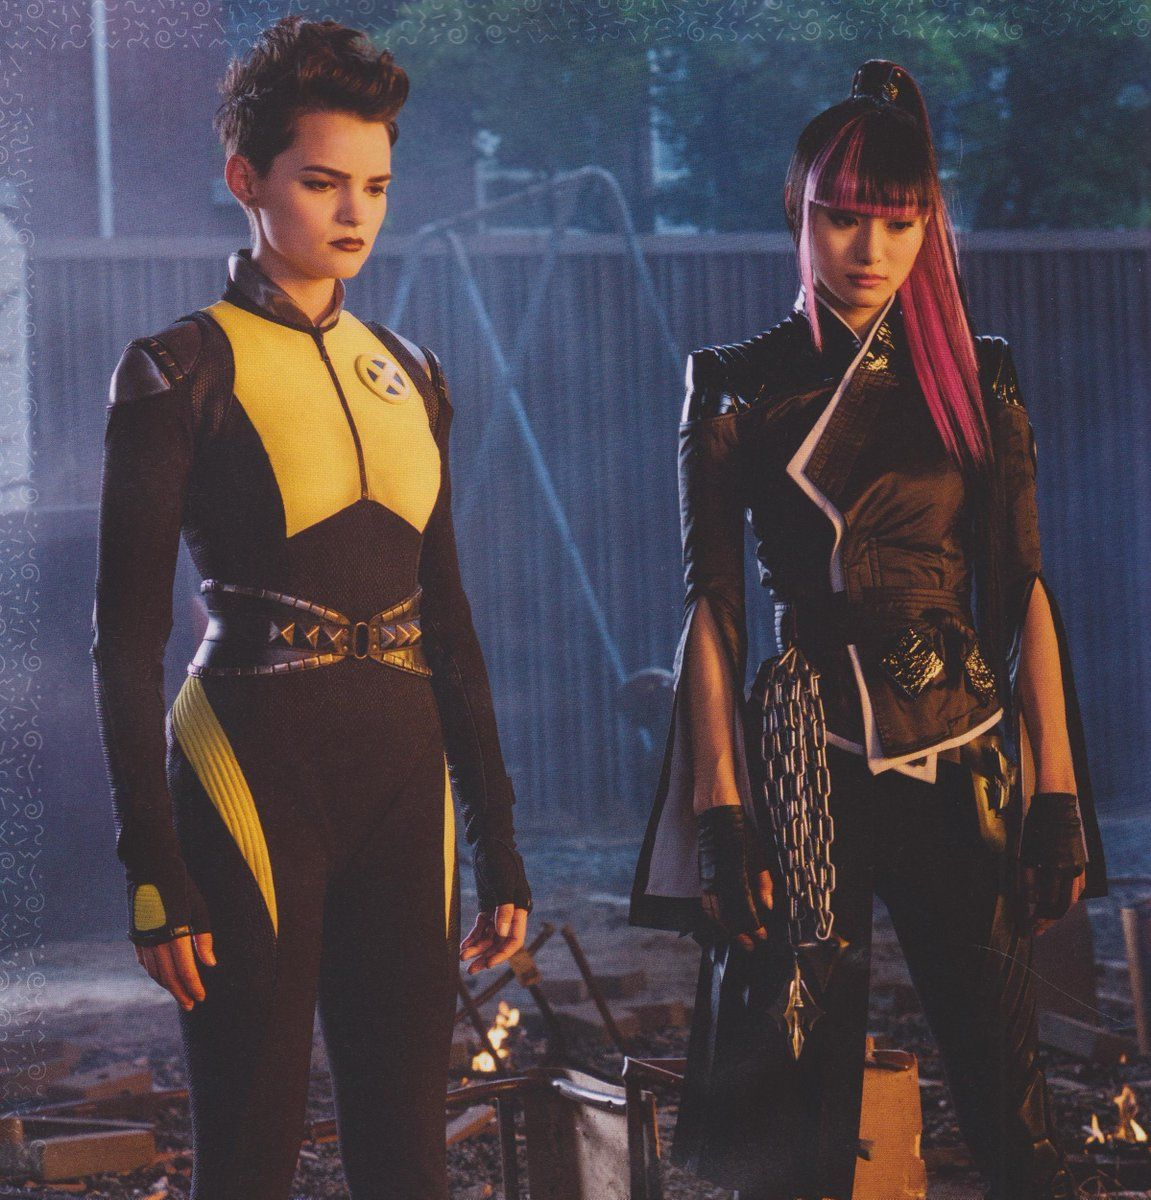 Pin By Laura On Favorite Characters Actors Teenage Warhead Superhero Villains Superhero Movies